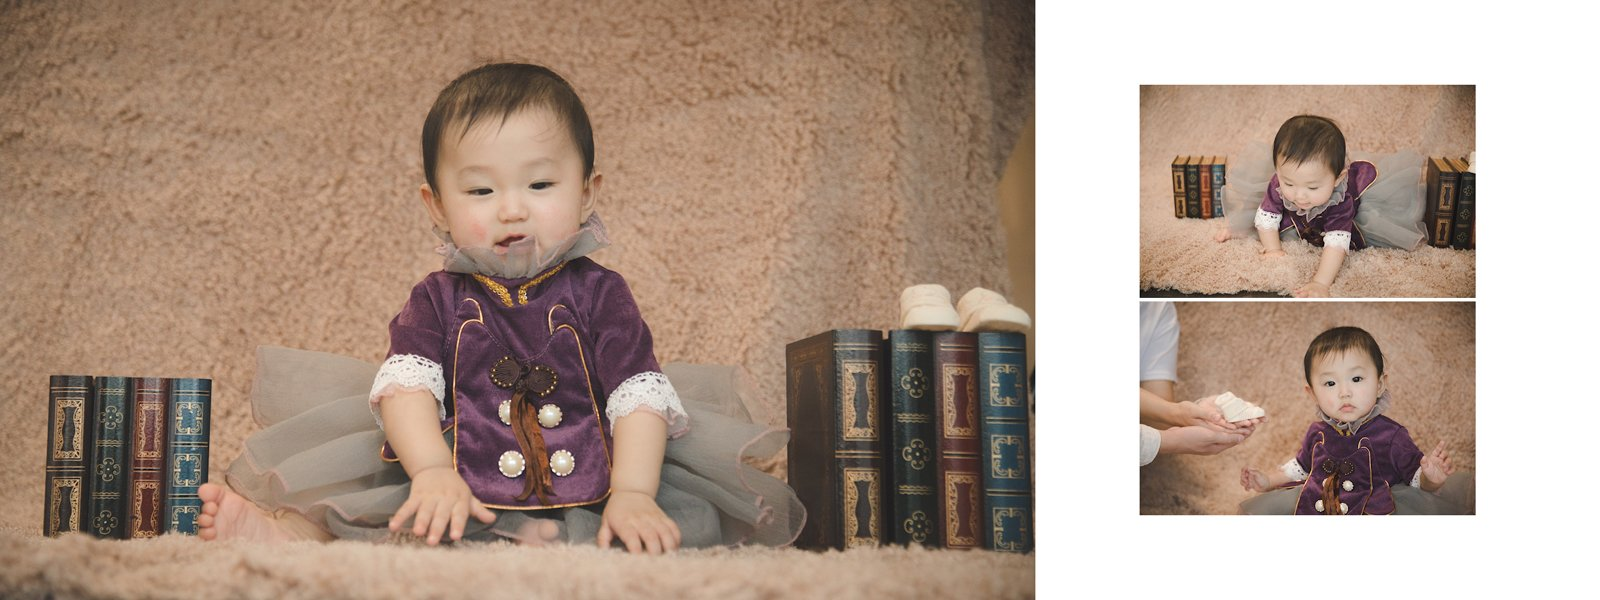 Baby: 我很愛諗書